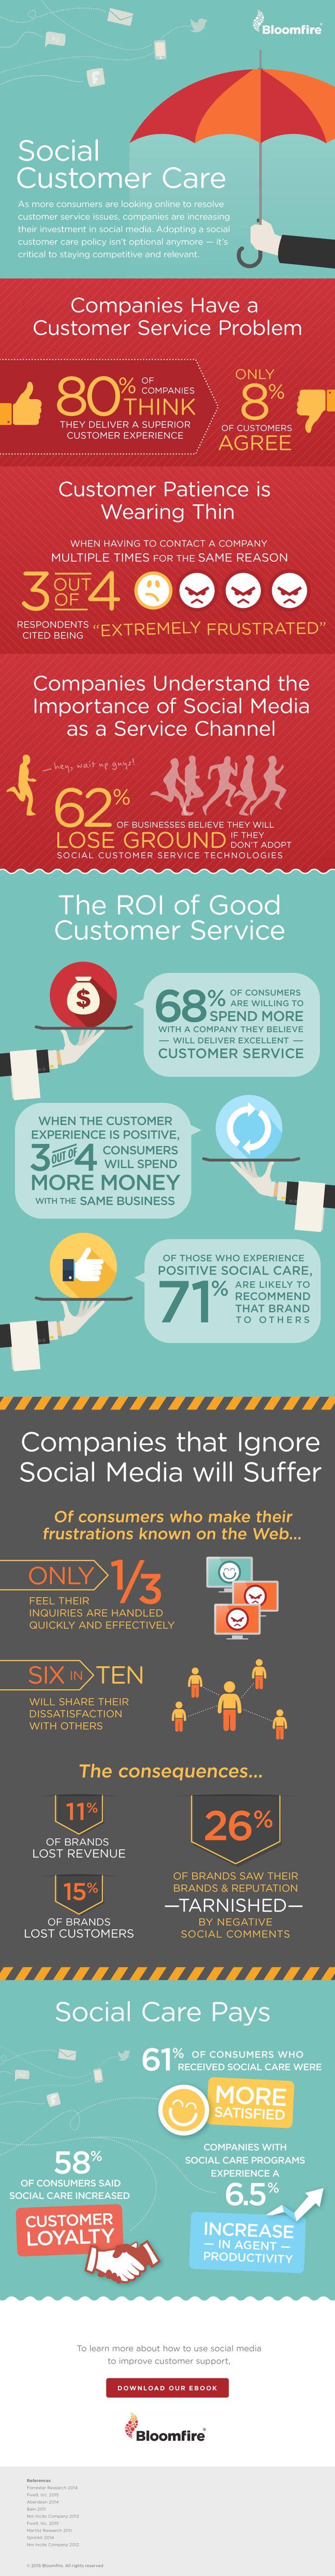 Social Customer Care via @angela4design #infographic #SocialMedia #CustomerService